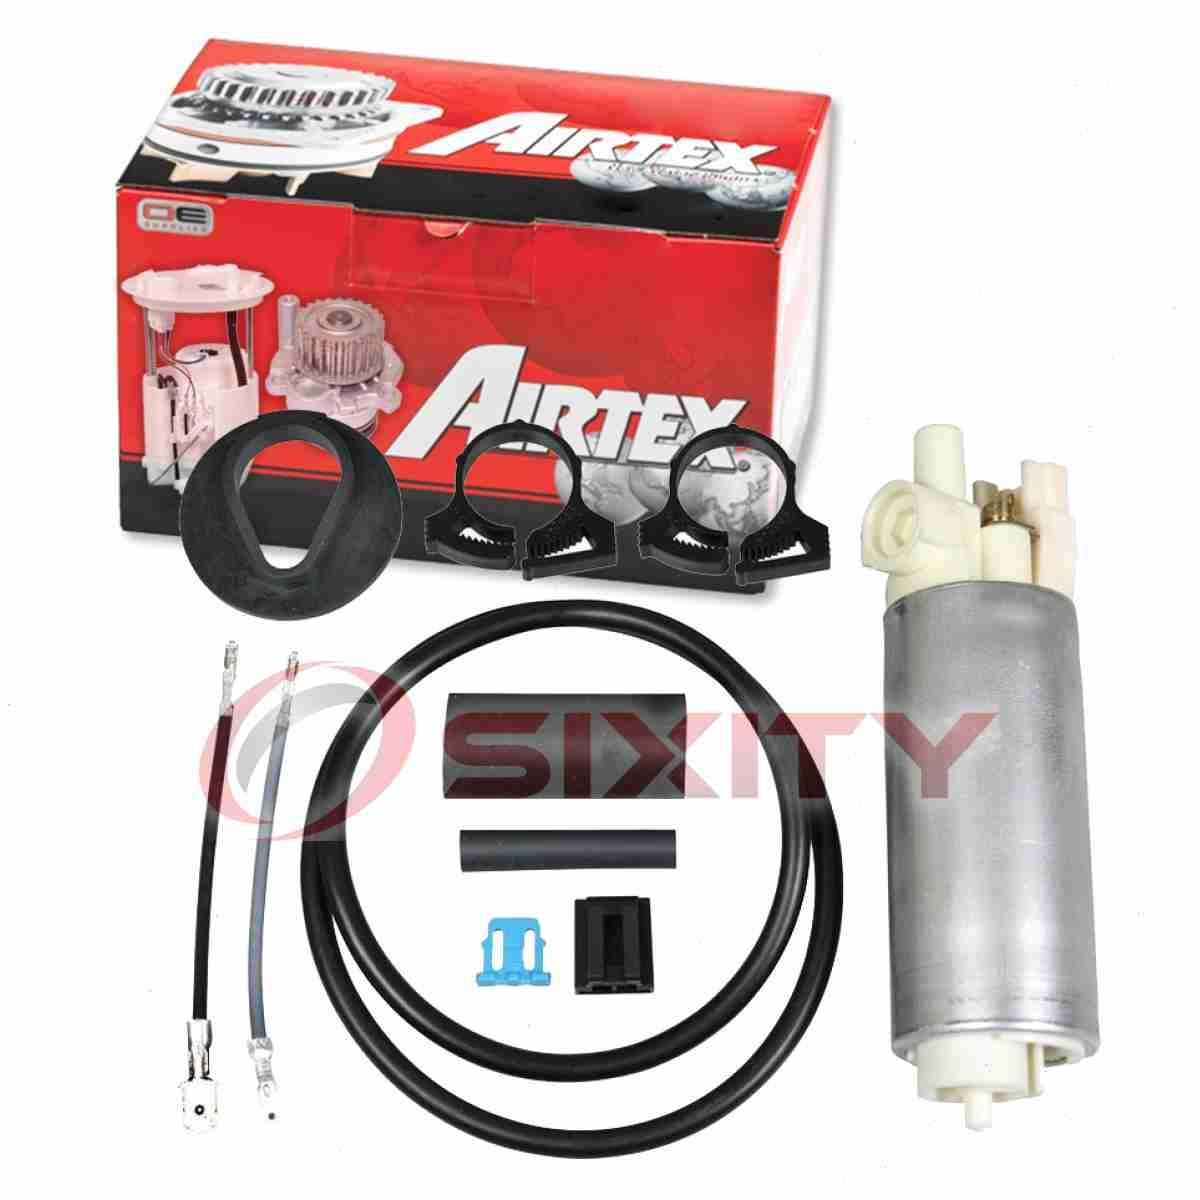 Airtex Fuel Pump and Sender Assembly for 1994-1995 GMC Sonoma 4.3L V6 ec